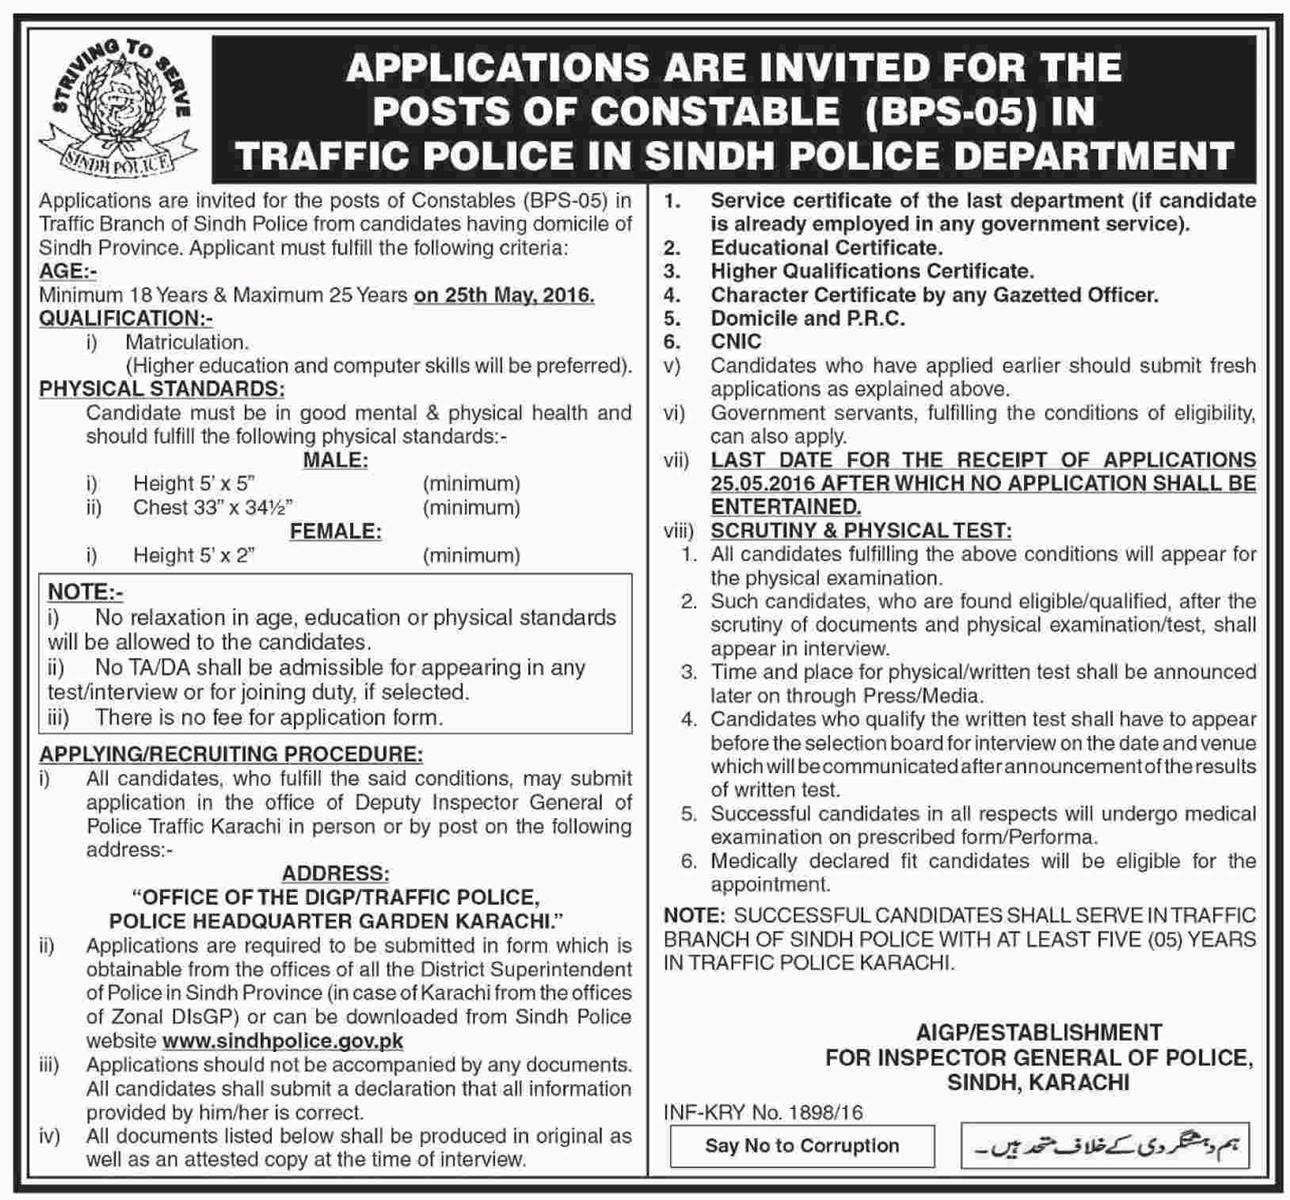 Sindh-Traffic-Police-Jobs-2016-321432 Job Application Form For Nurses on